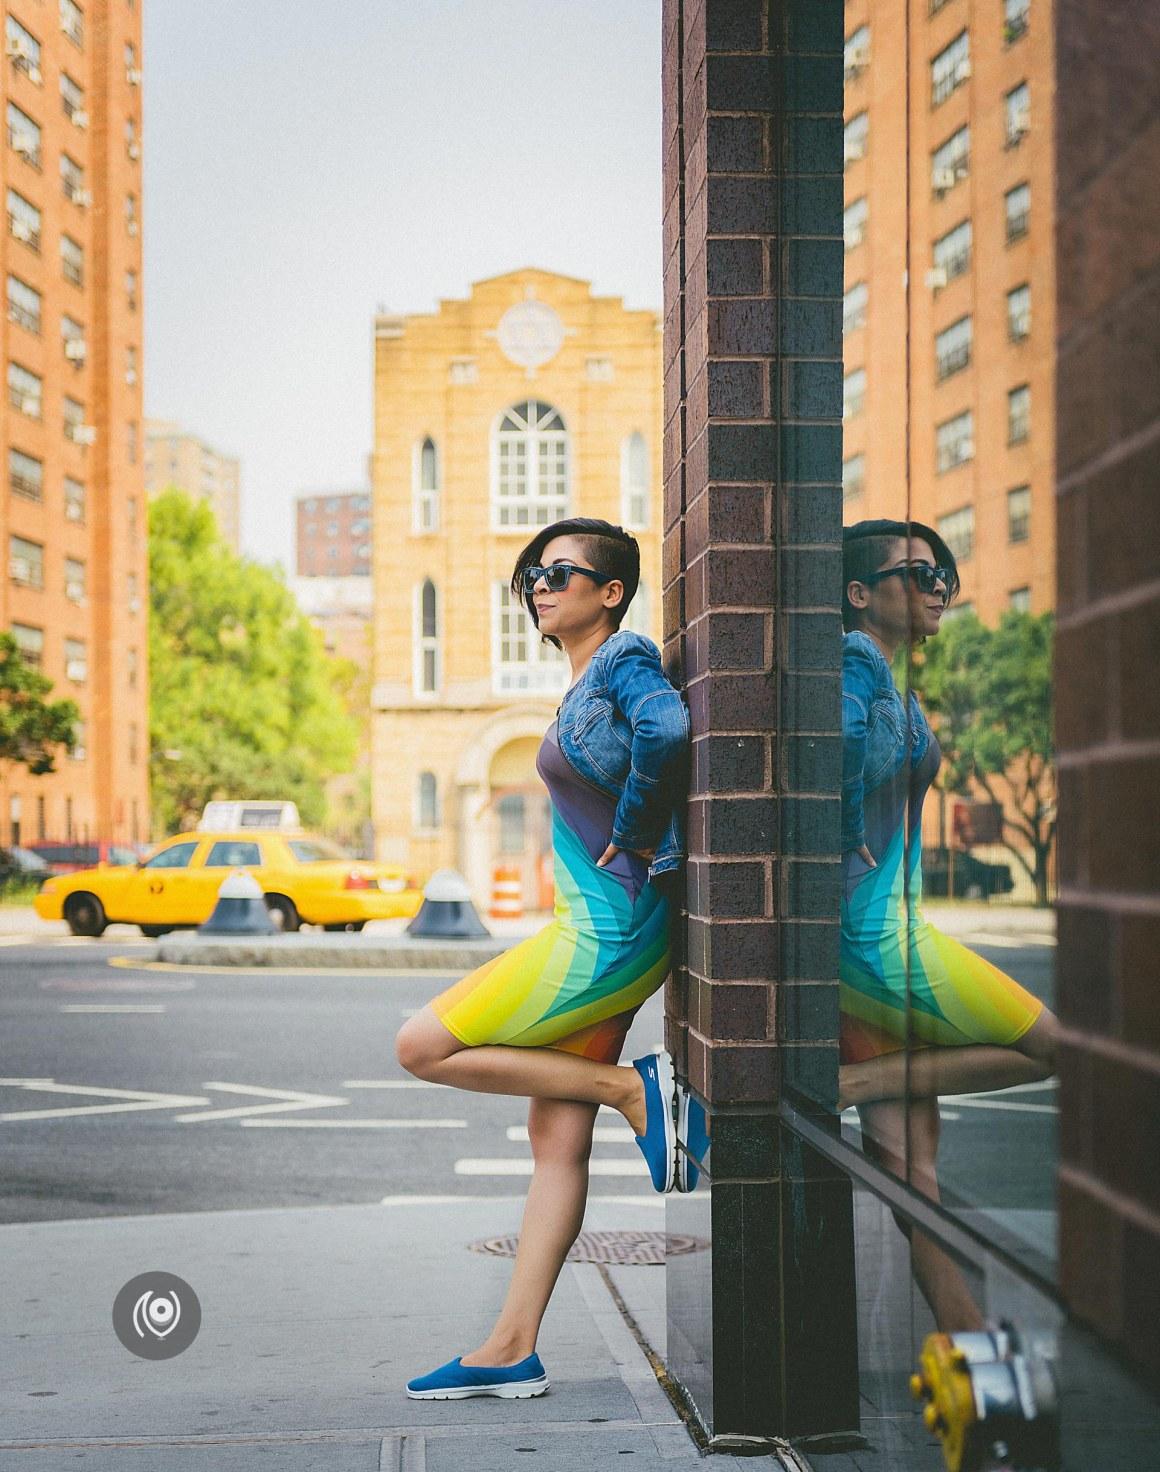 Rainbow Summer #CoverUp 50 #EyesForNewYork #REDHUxNYC #REDHUxAIRBNB Naina.co Luxury & Lifestyle, Photographer Storyteller, Blogger